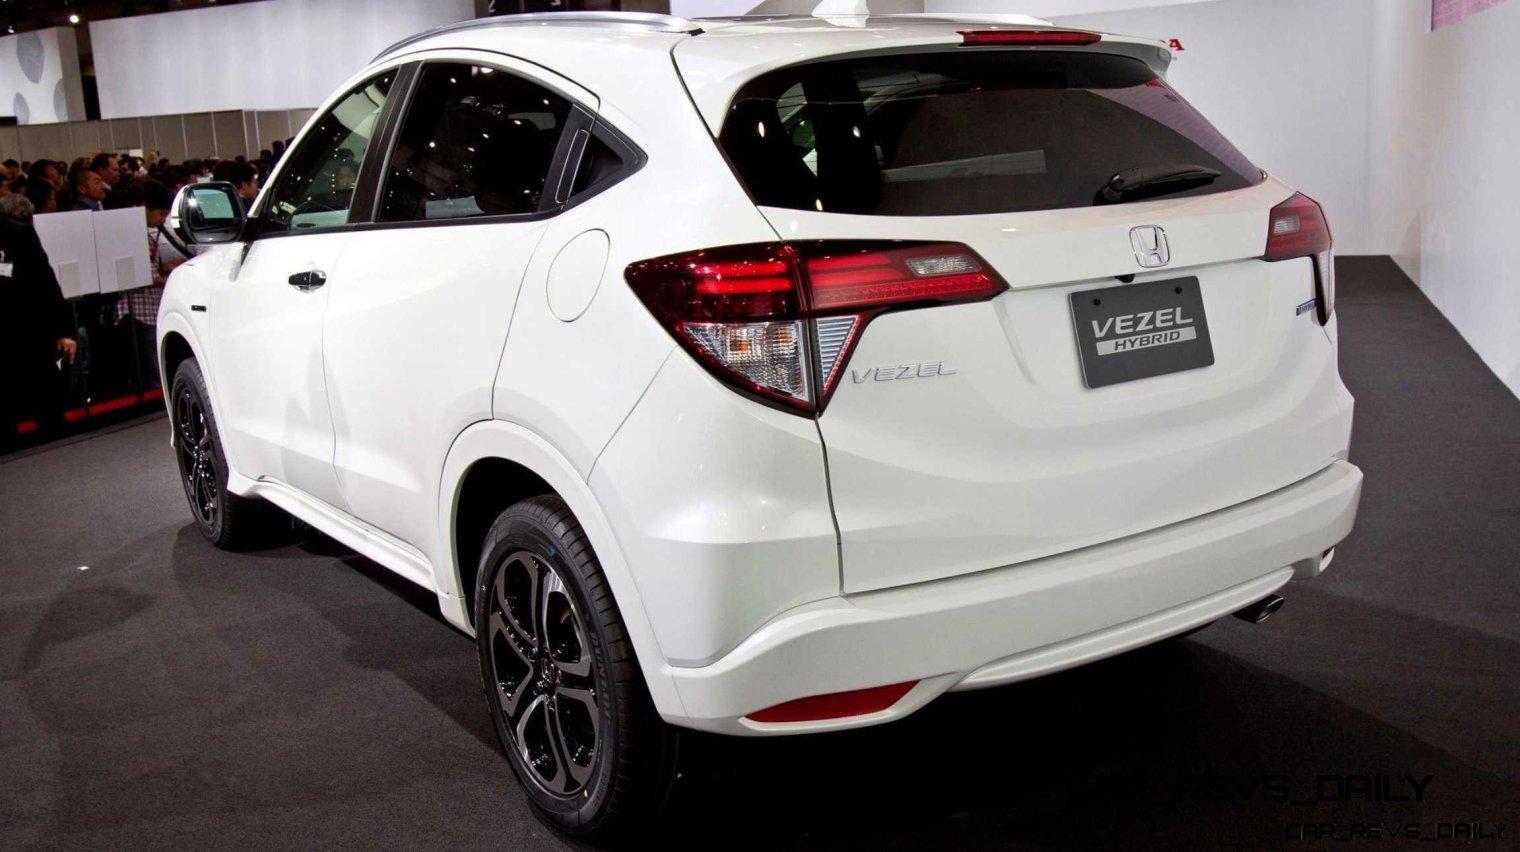 Cool! 2015 Honda Vezel Hybrid Previews Spring 2014 Civic CUV5